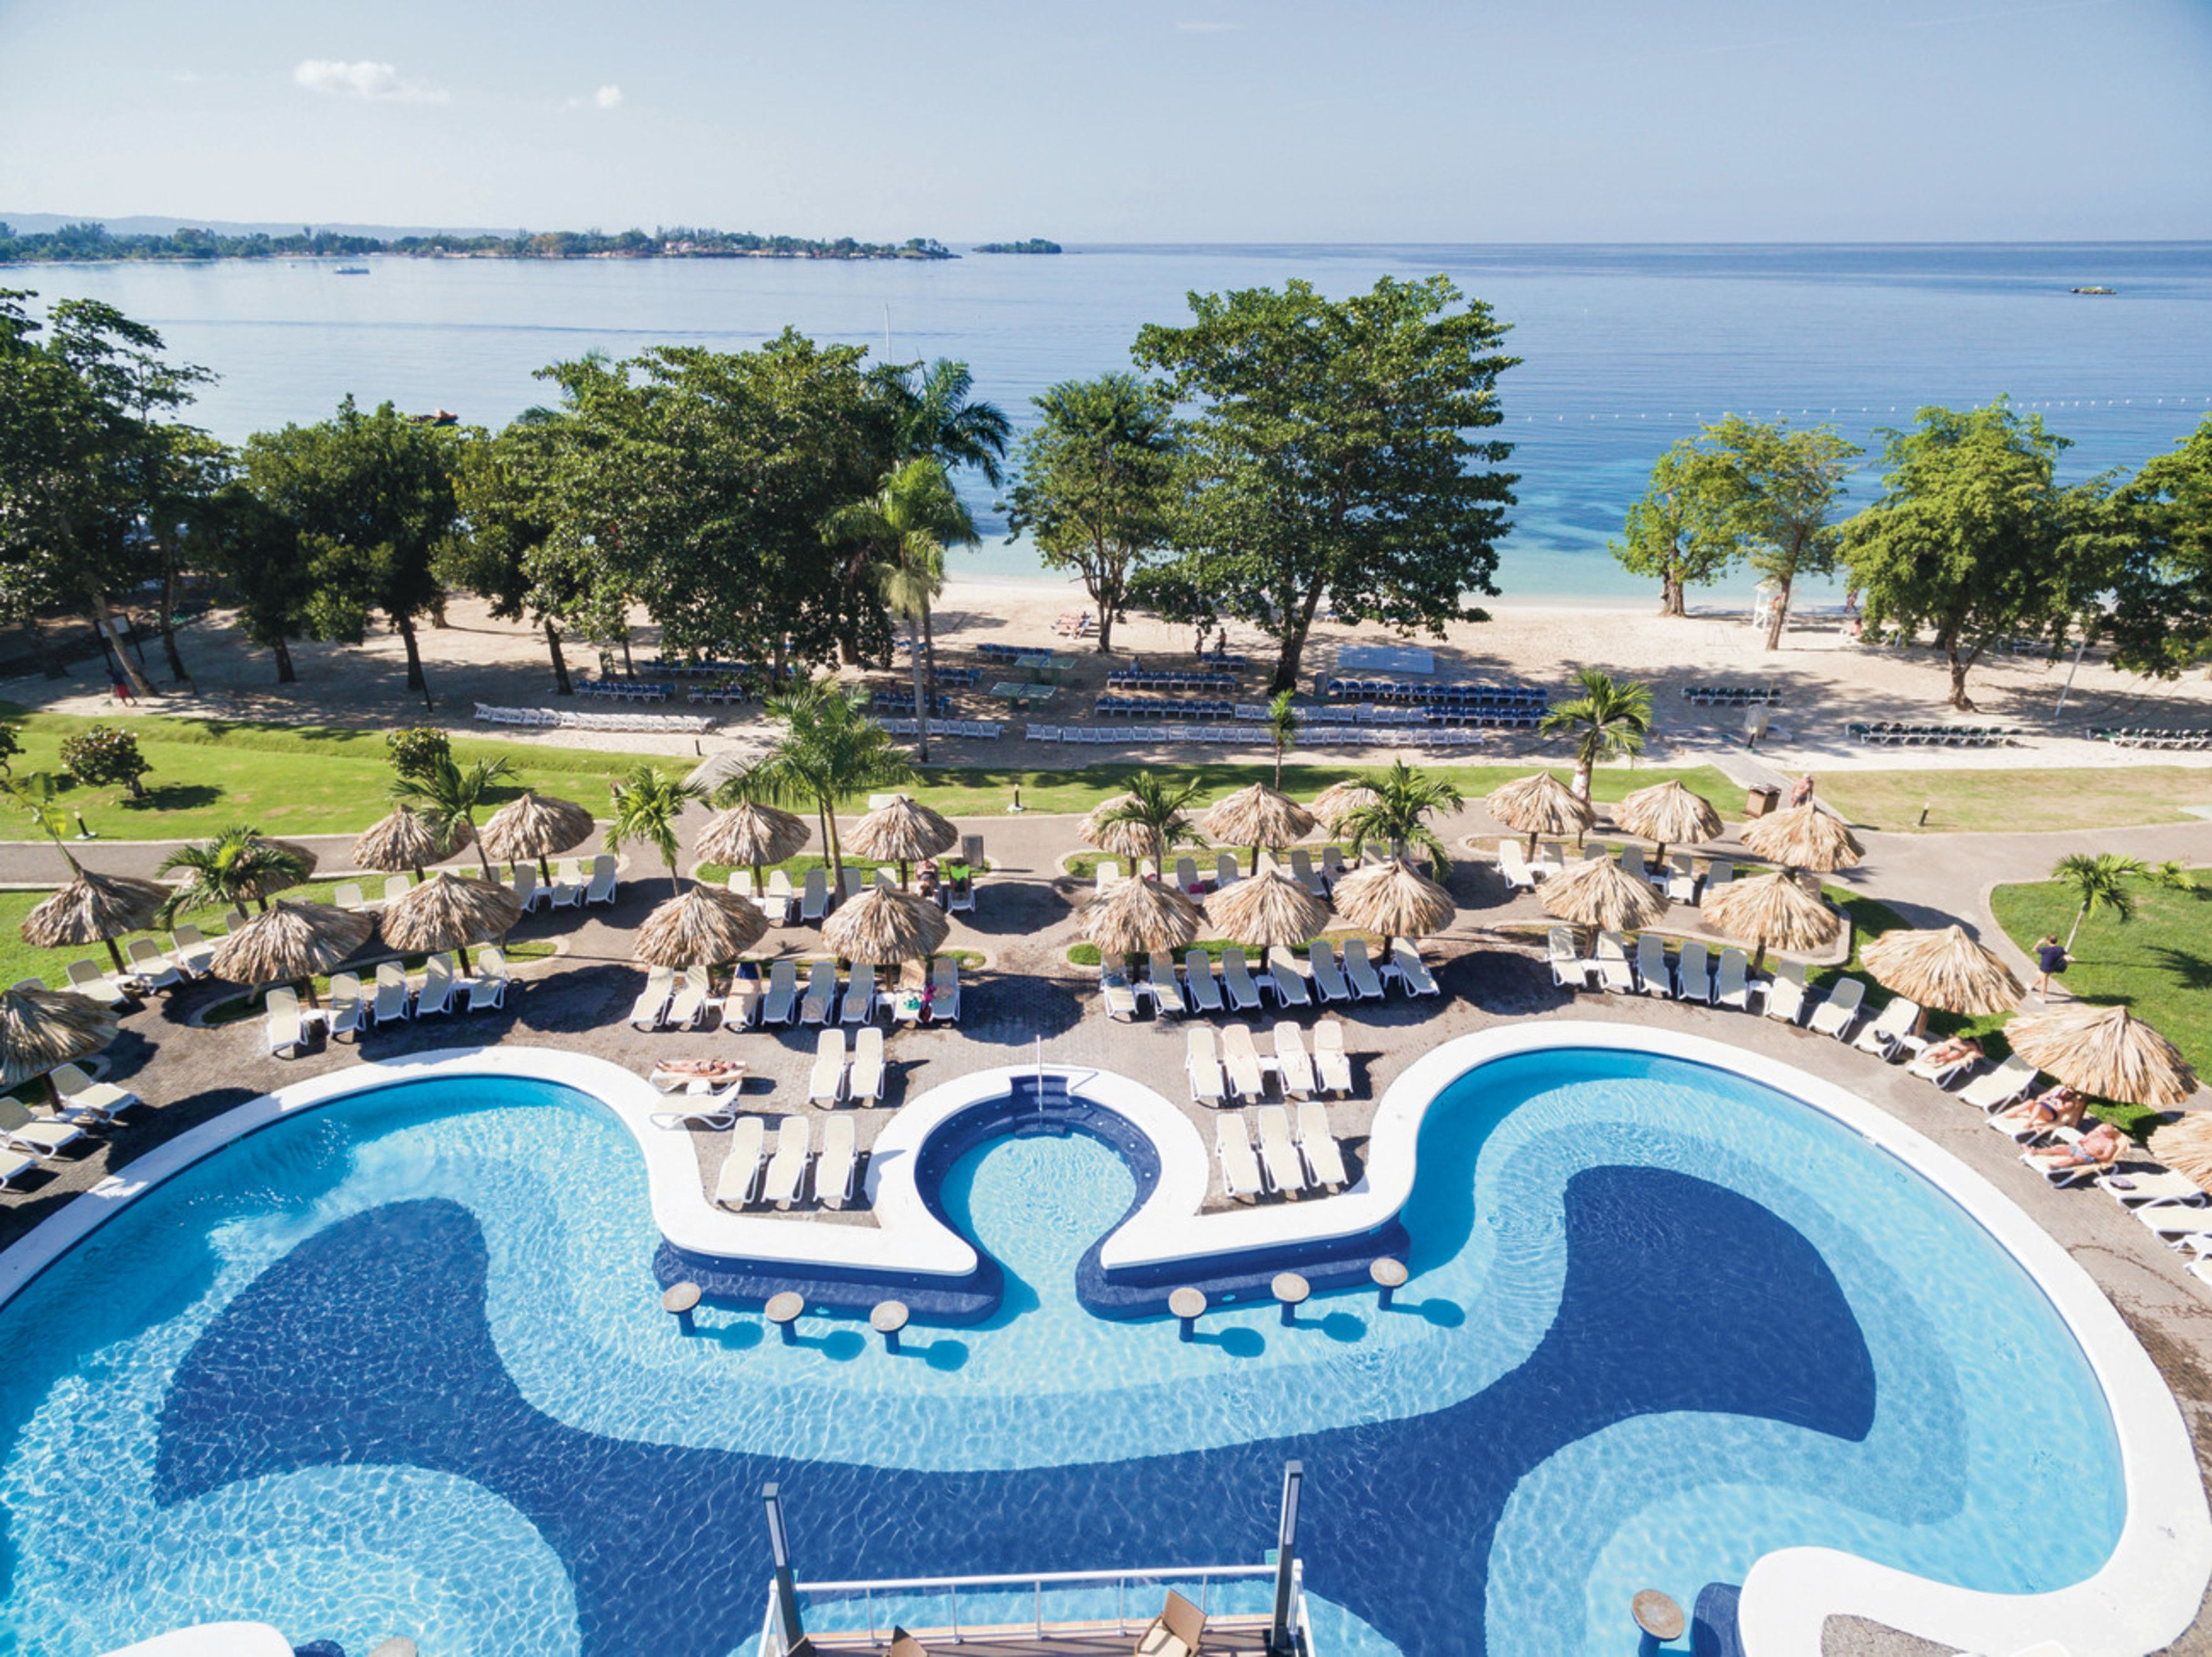 Clubhotel Riu Negril All Inclusive 24h Hotel In Negril